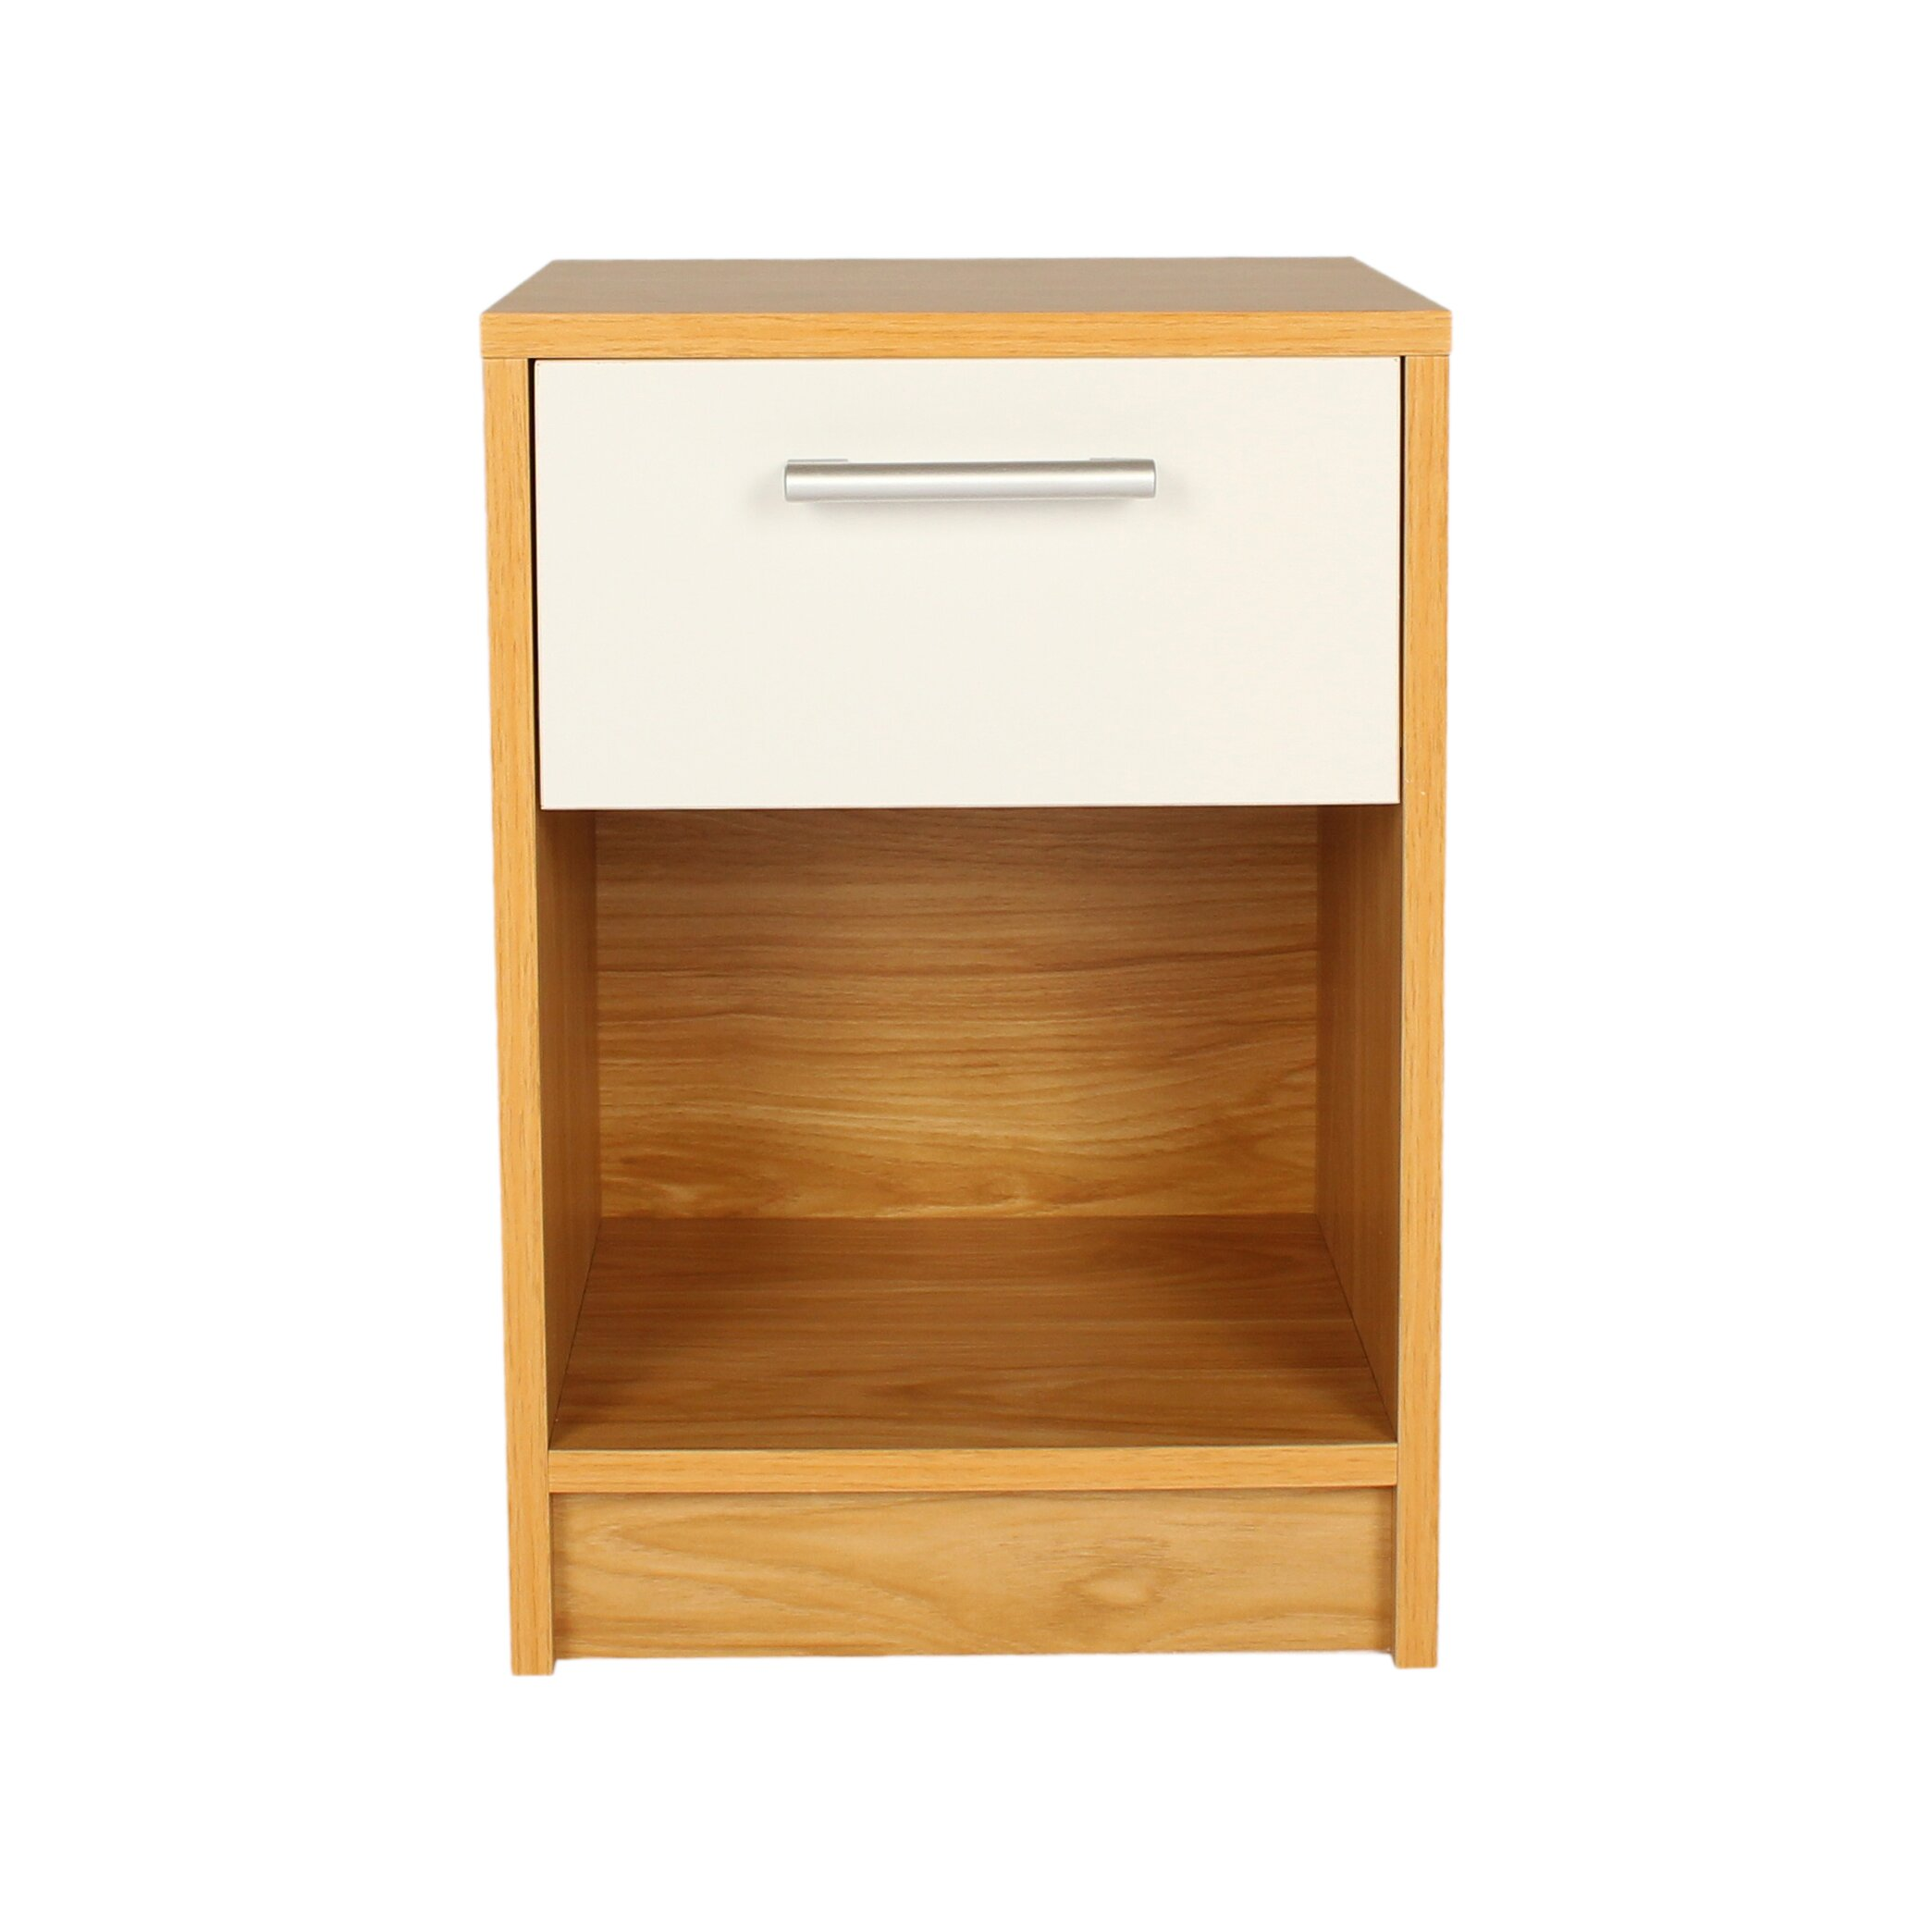 Dcor design nule 1 drawer bedside table wayfair uk for 1 drawer bedside table